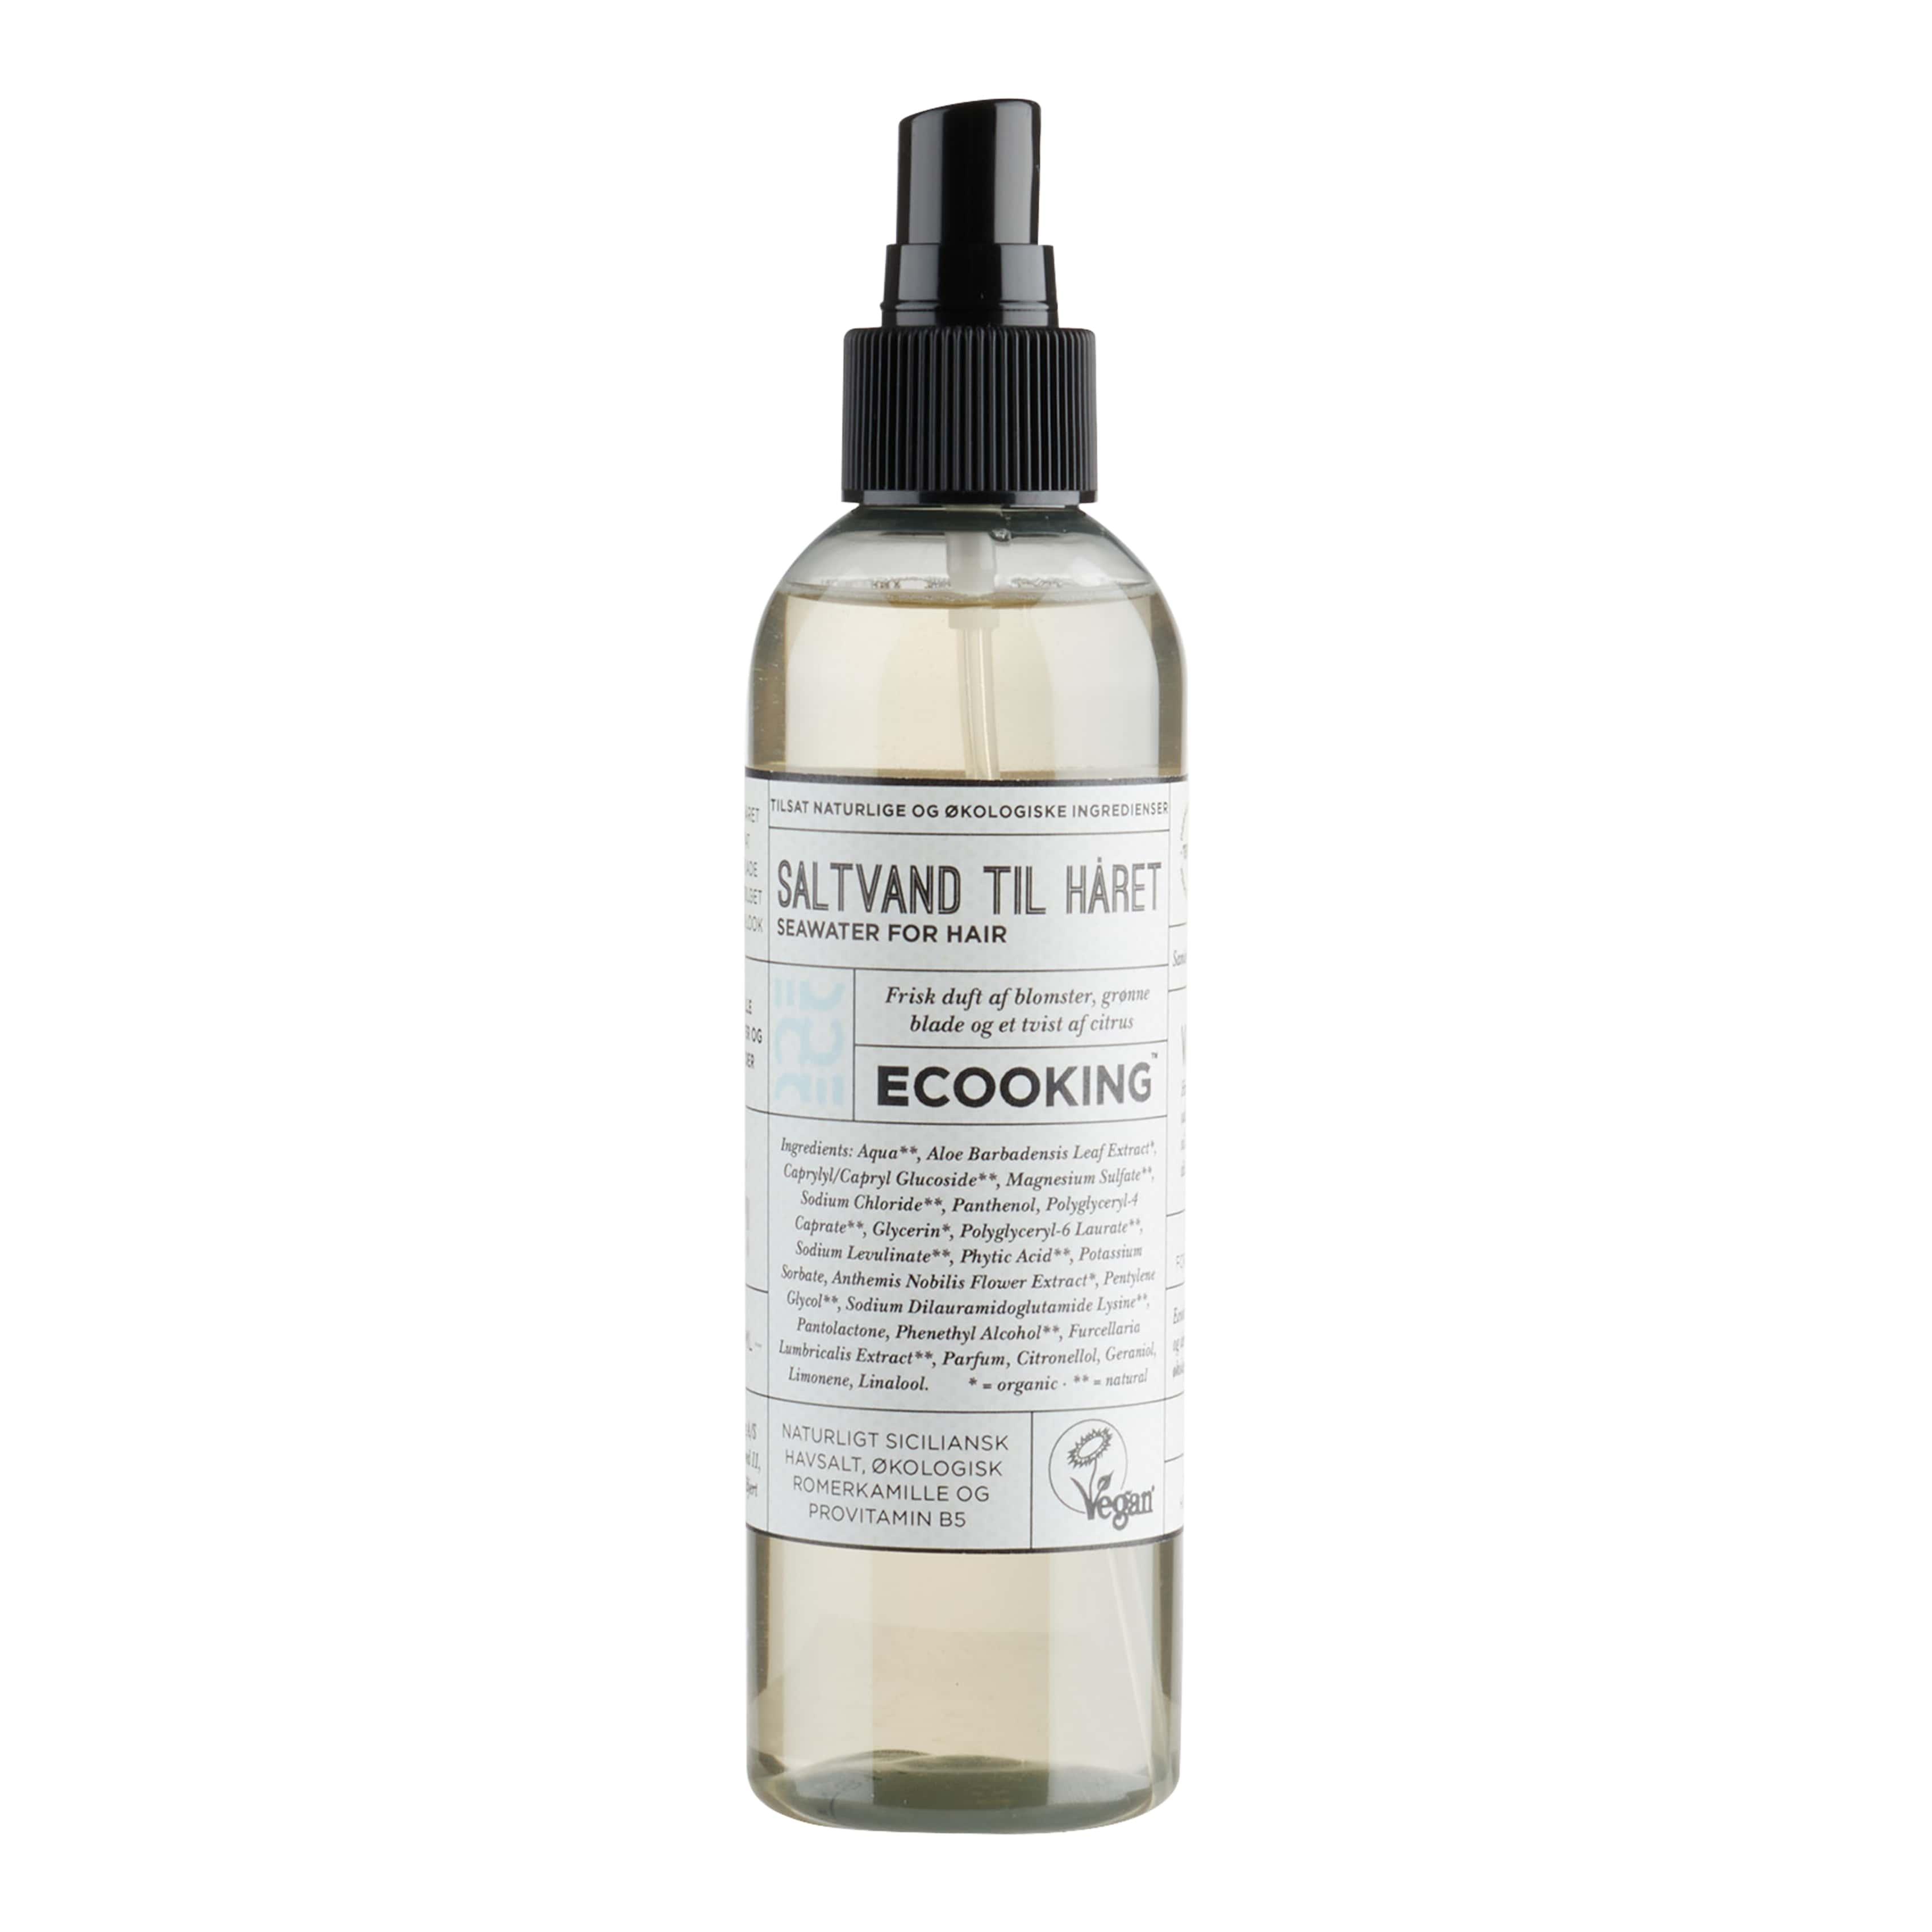 Ecooking Saltvand til Håret, 200 ml